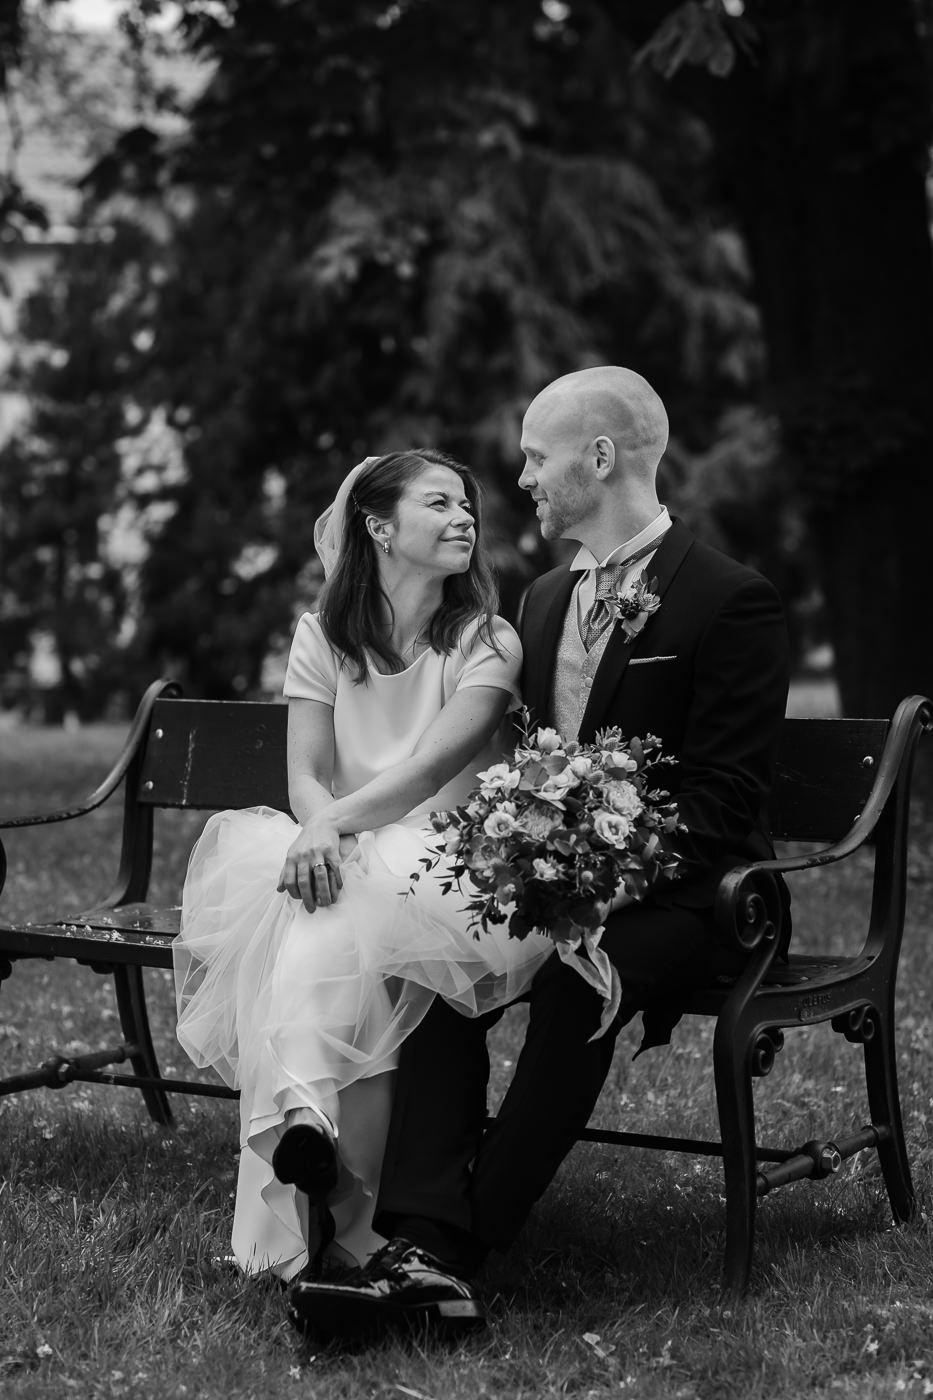 Malene & Ole Martin - elegant dansk- norskt bryllup i Oslo Bryllup Gamle Aker Oslo 39 Akershus